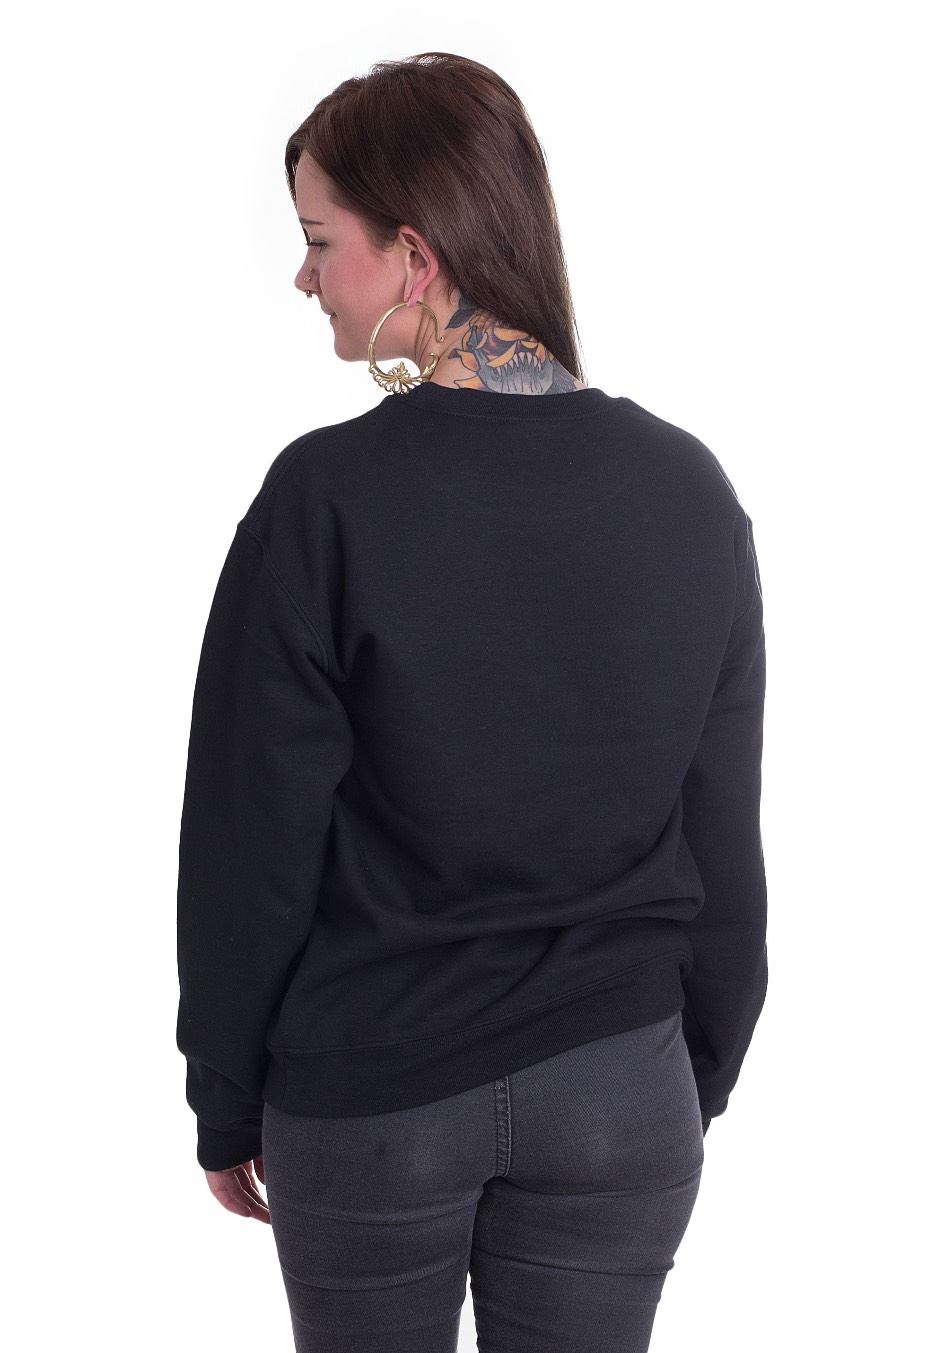 Whitechapel - Starblade Xmas - Sweater - Impericon.com AU 303b0c6f6